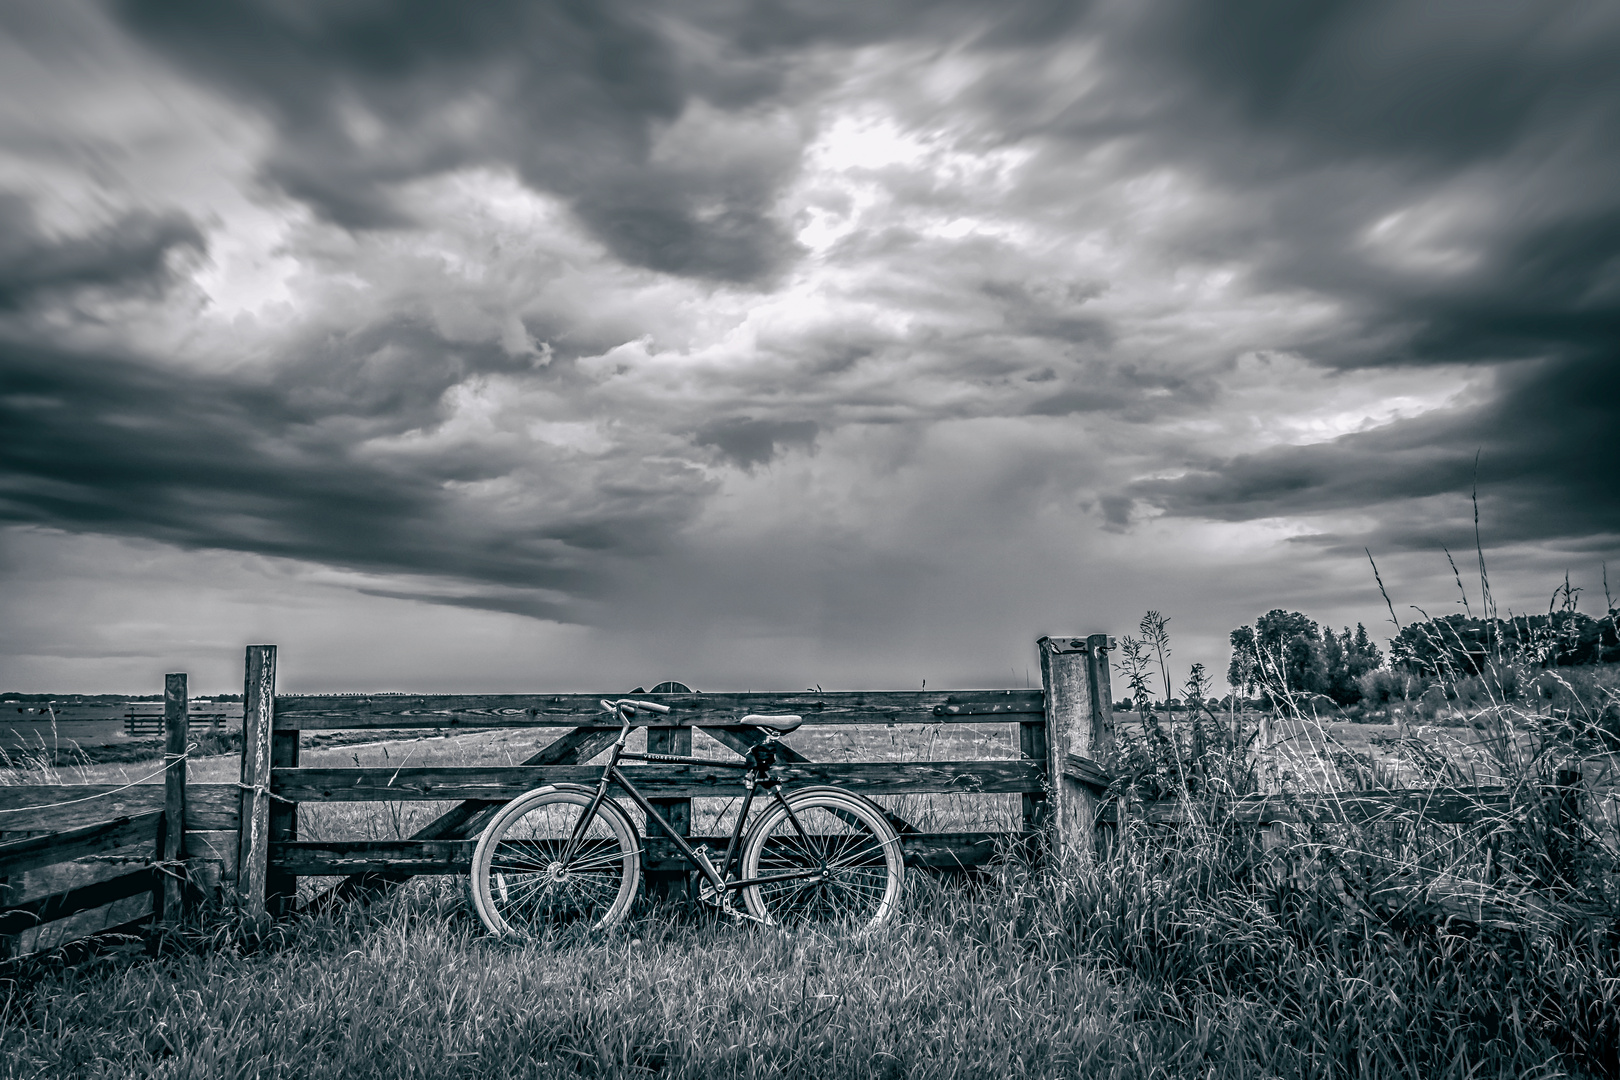 Fahrrad im nahenden Regen